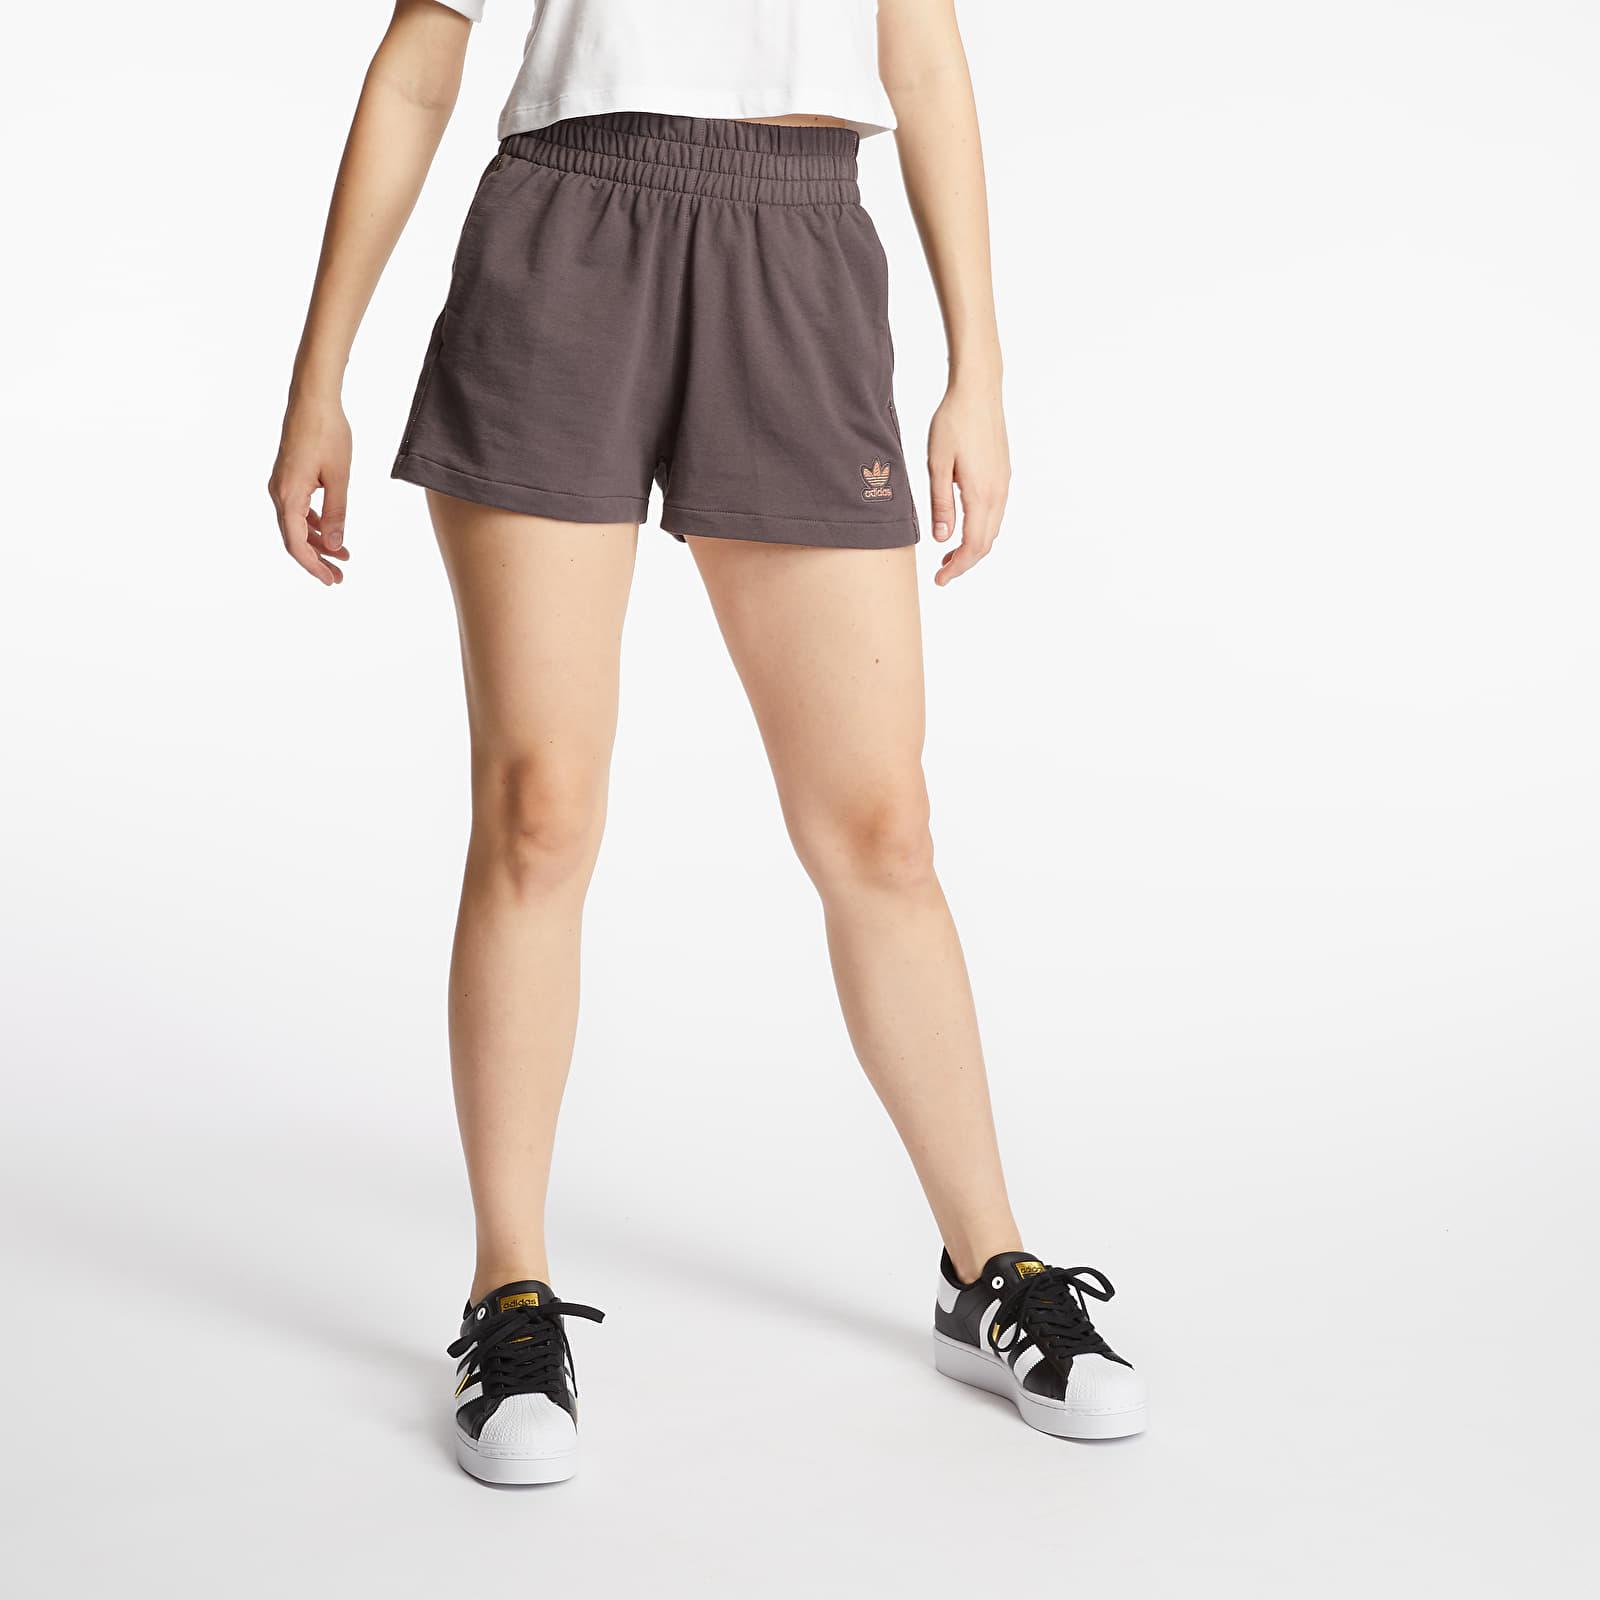 Kurzhosen adidas 3 Stripes Shorts Urban Trail